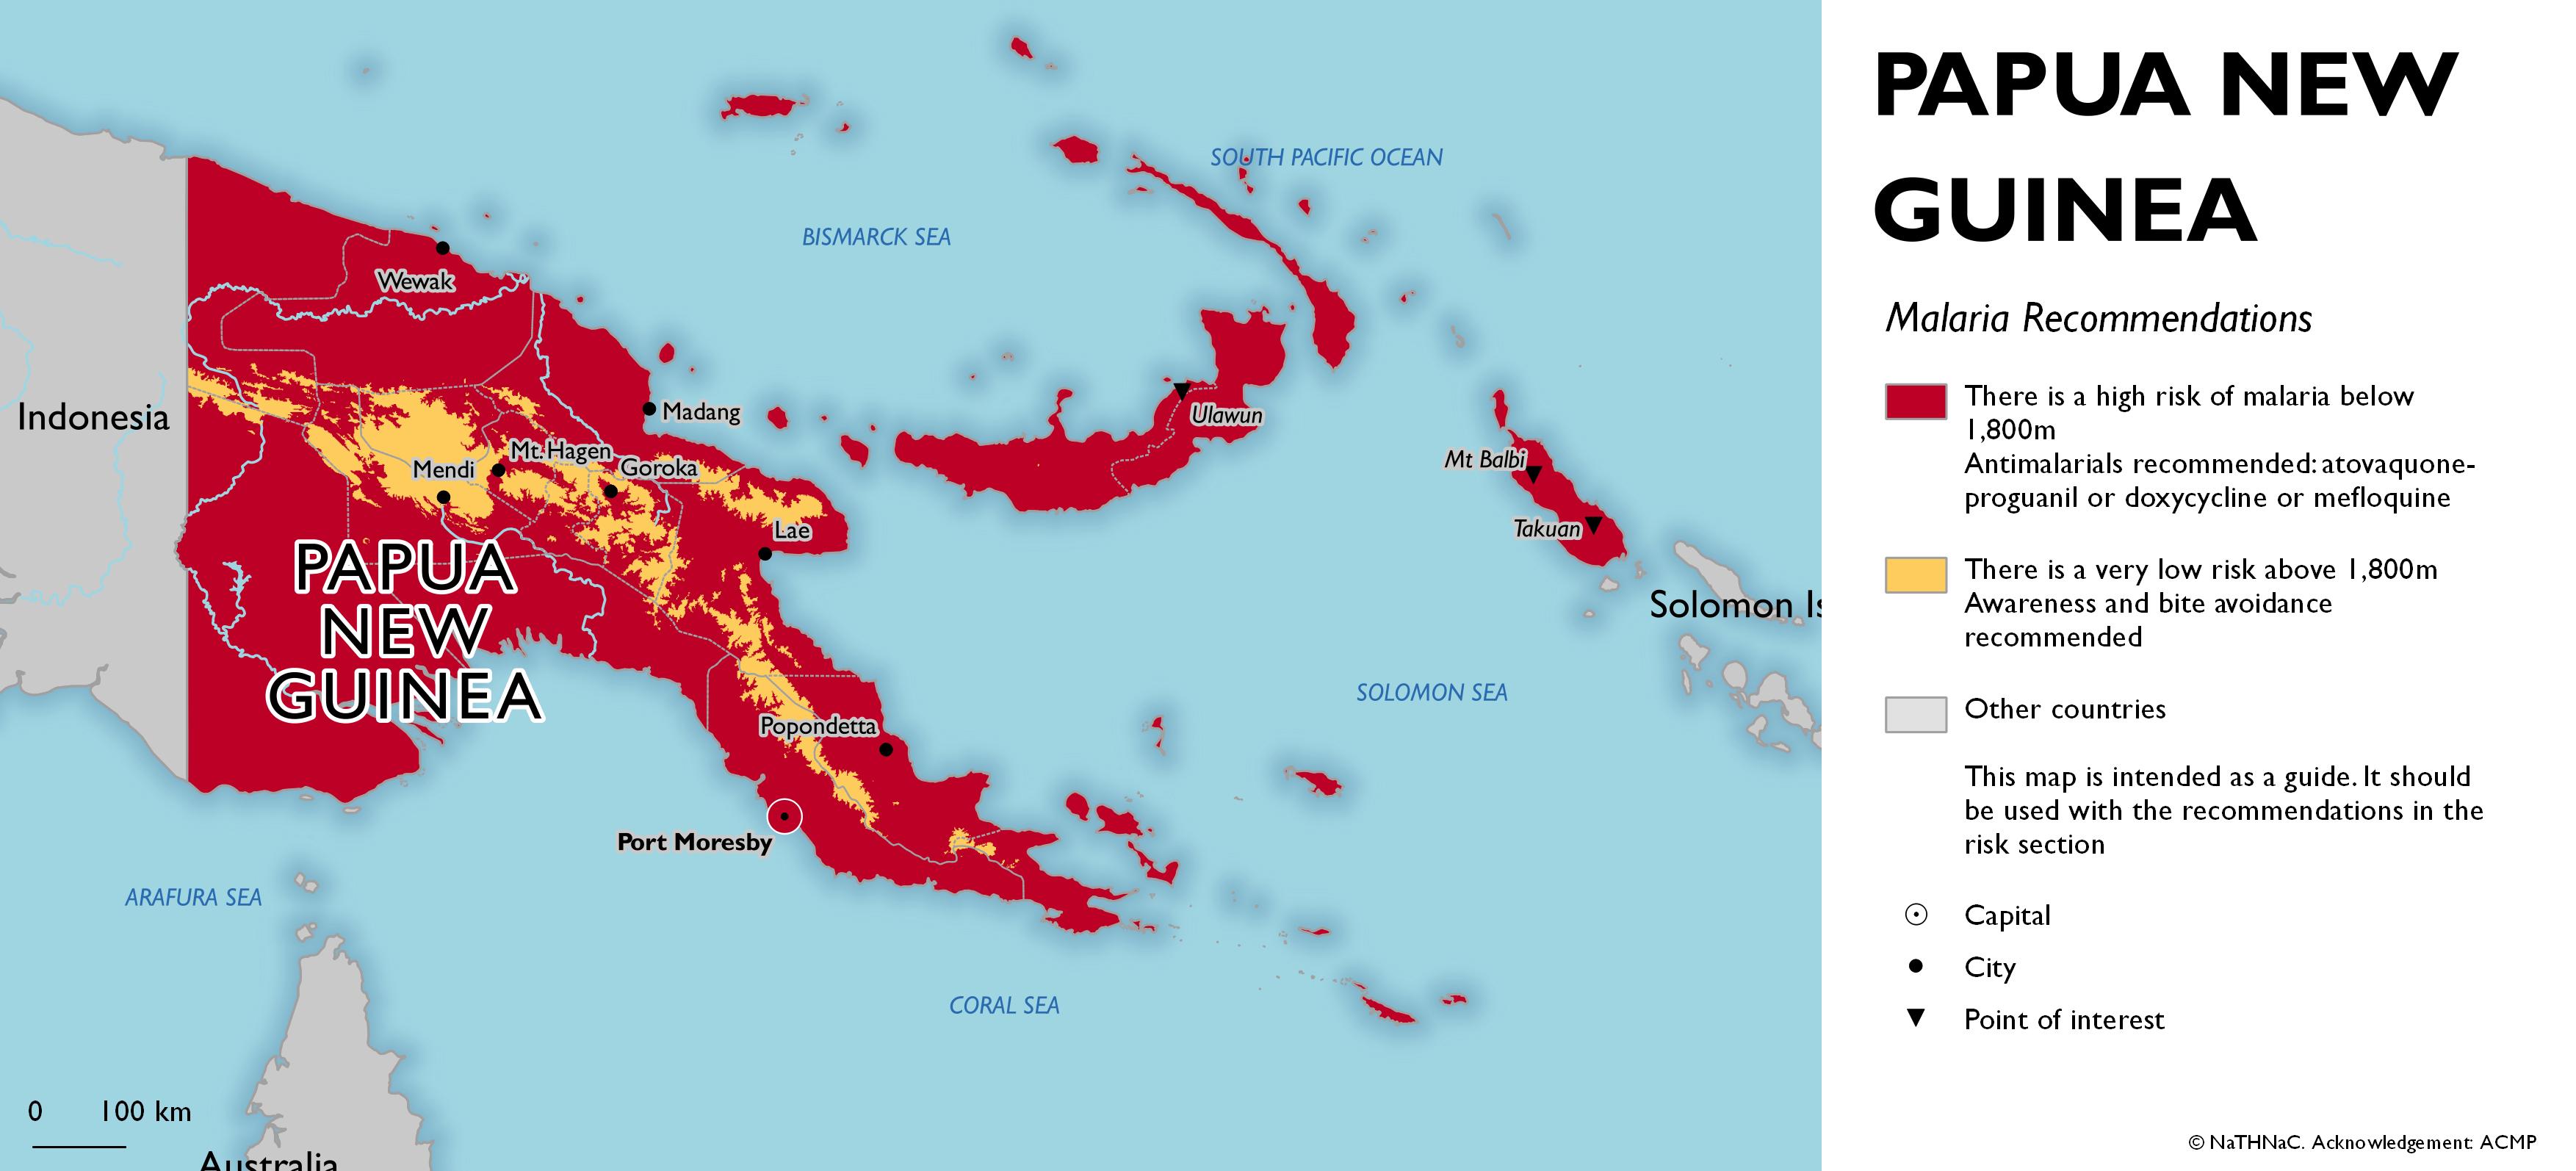 NaTHNaC - Papua New Guinea